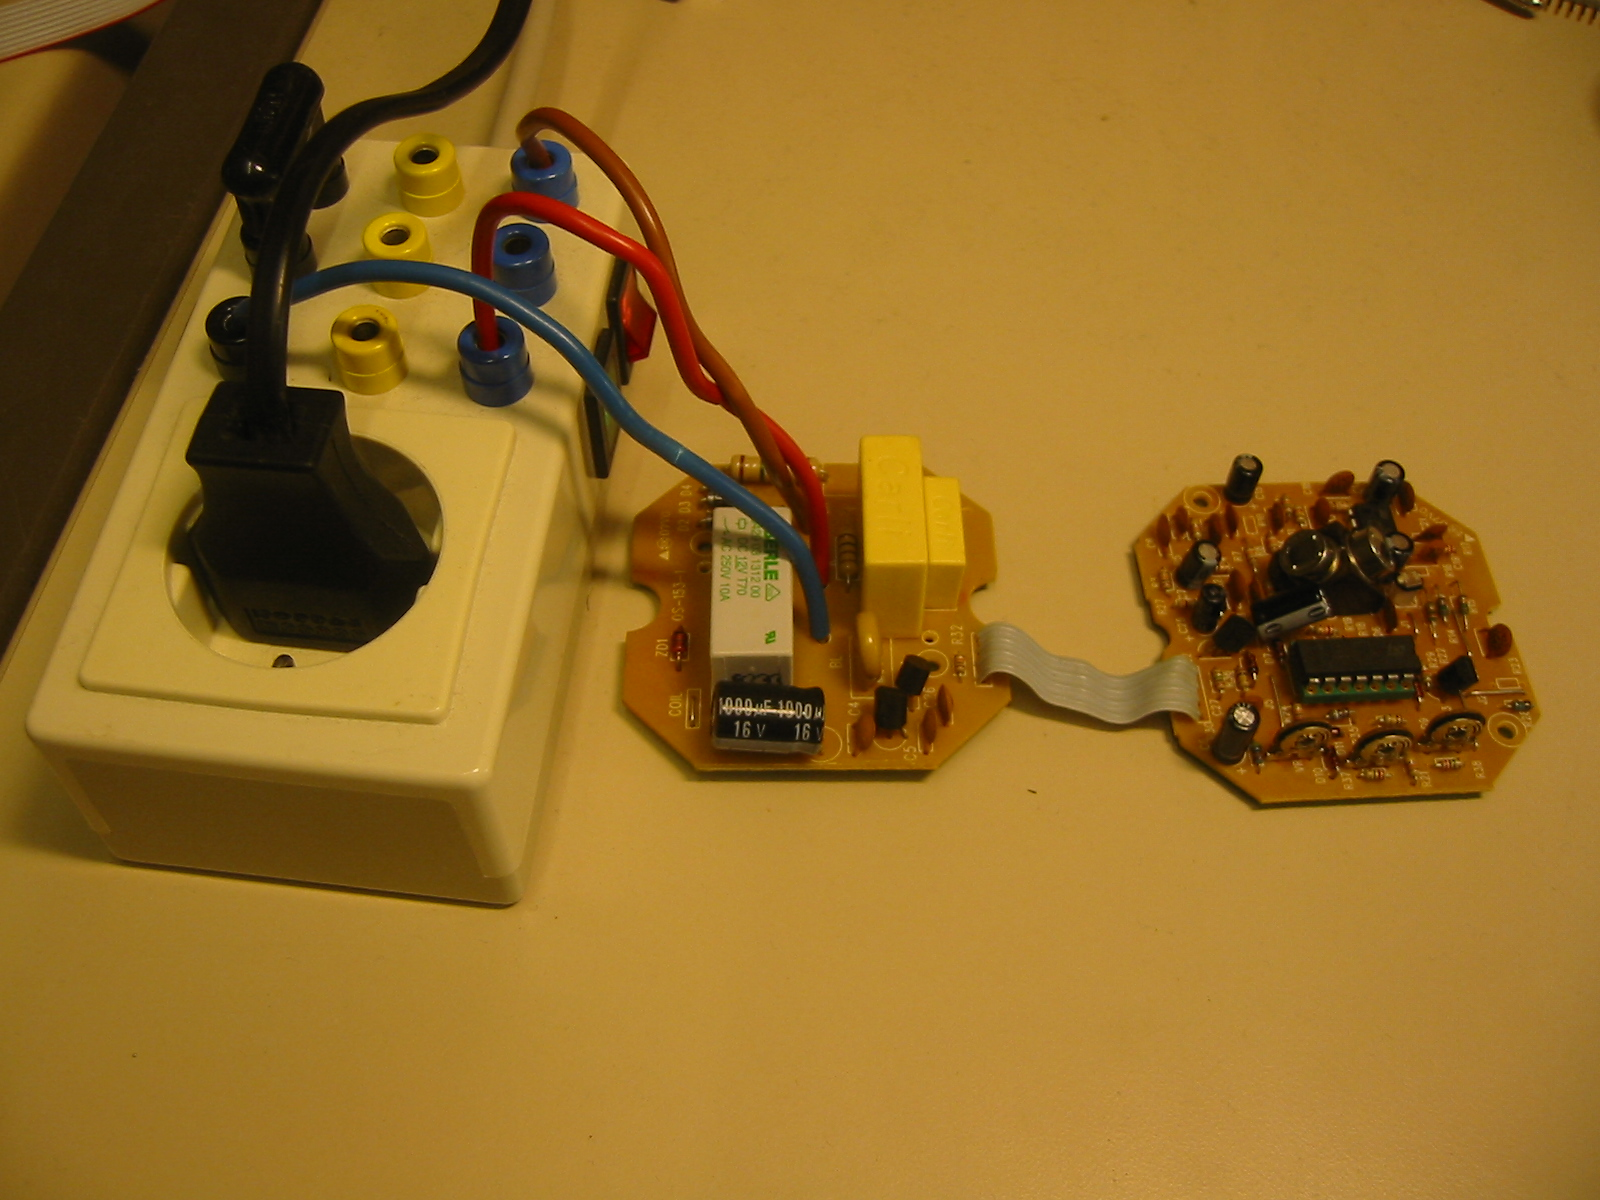 Bewegungsmelder Reparatur Mikrocontrollernet